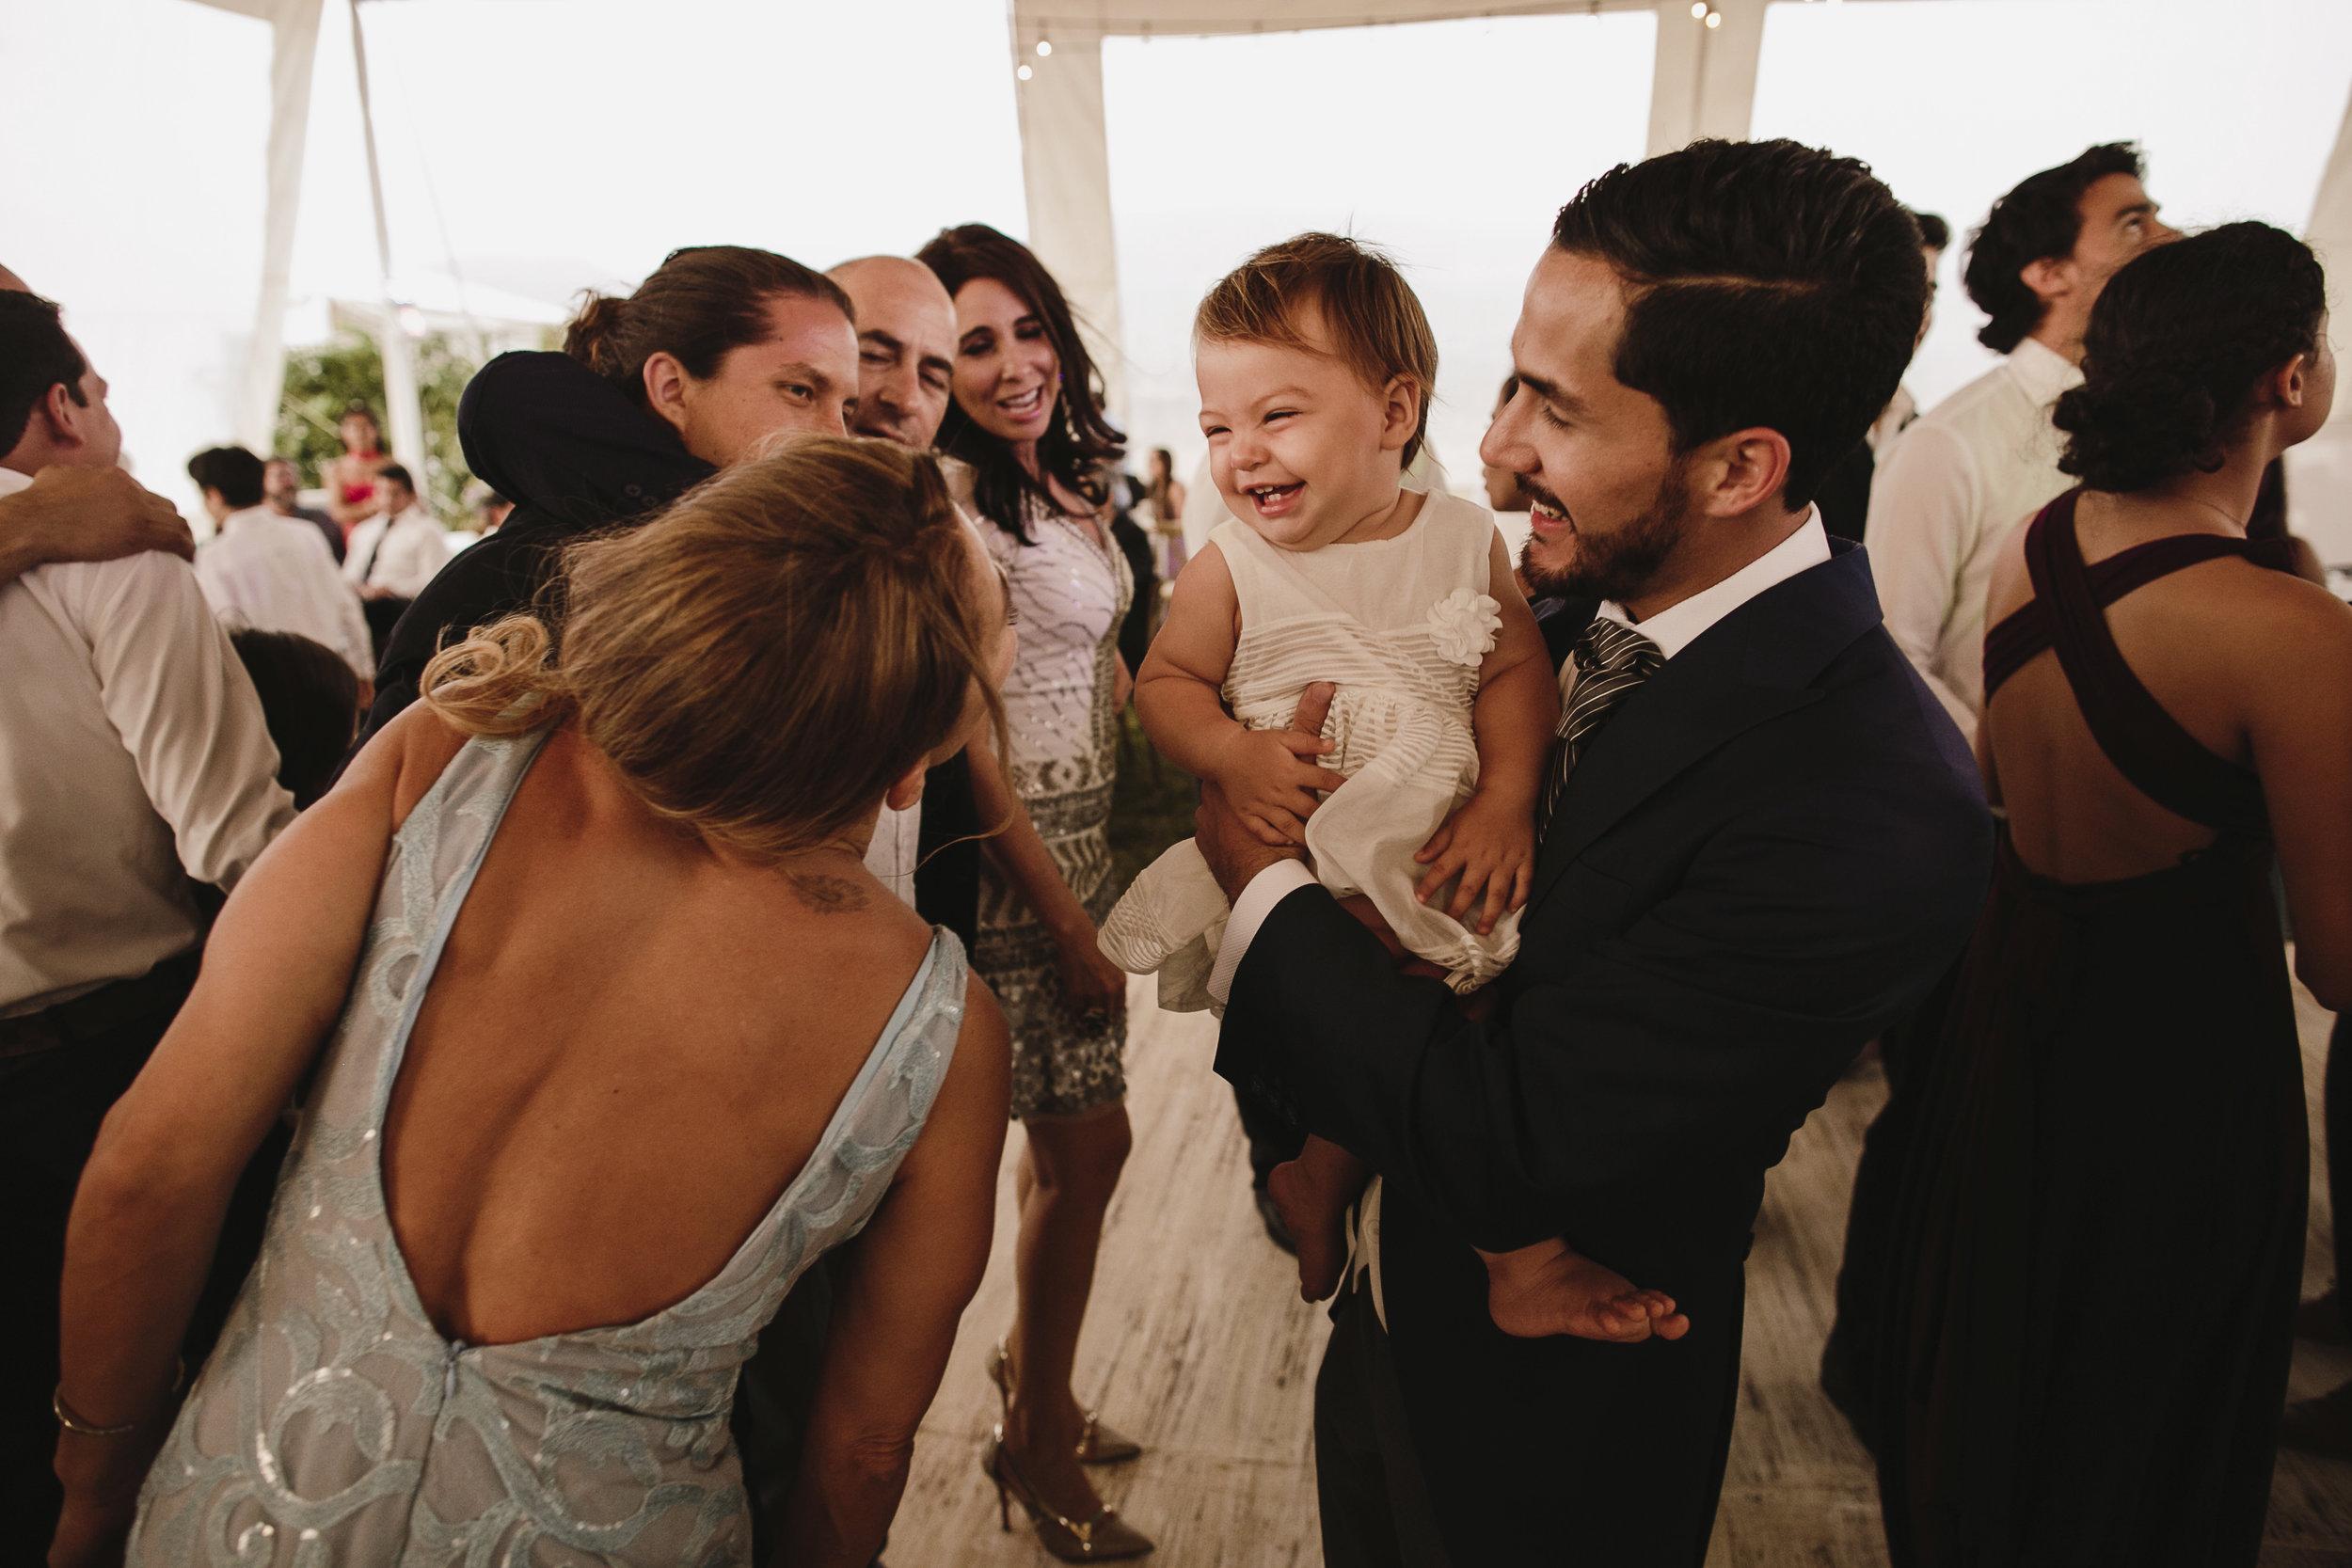 alfons_flores_destination_wedding_photography_mavi_david-1775.JPG